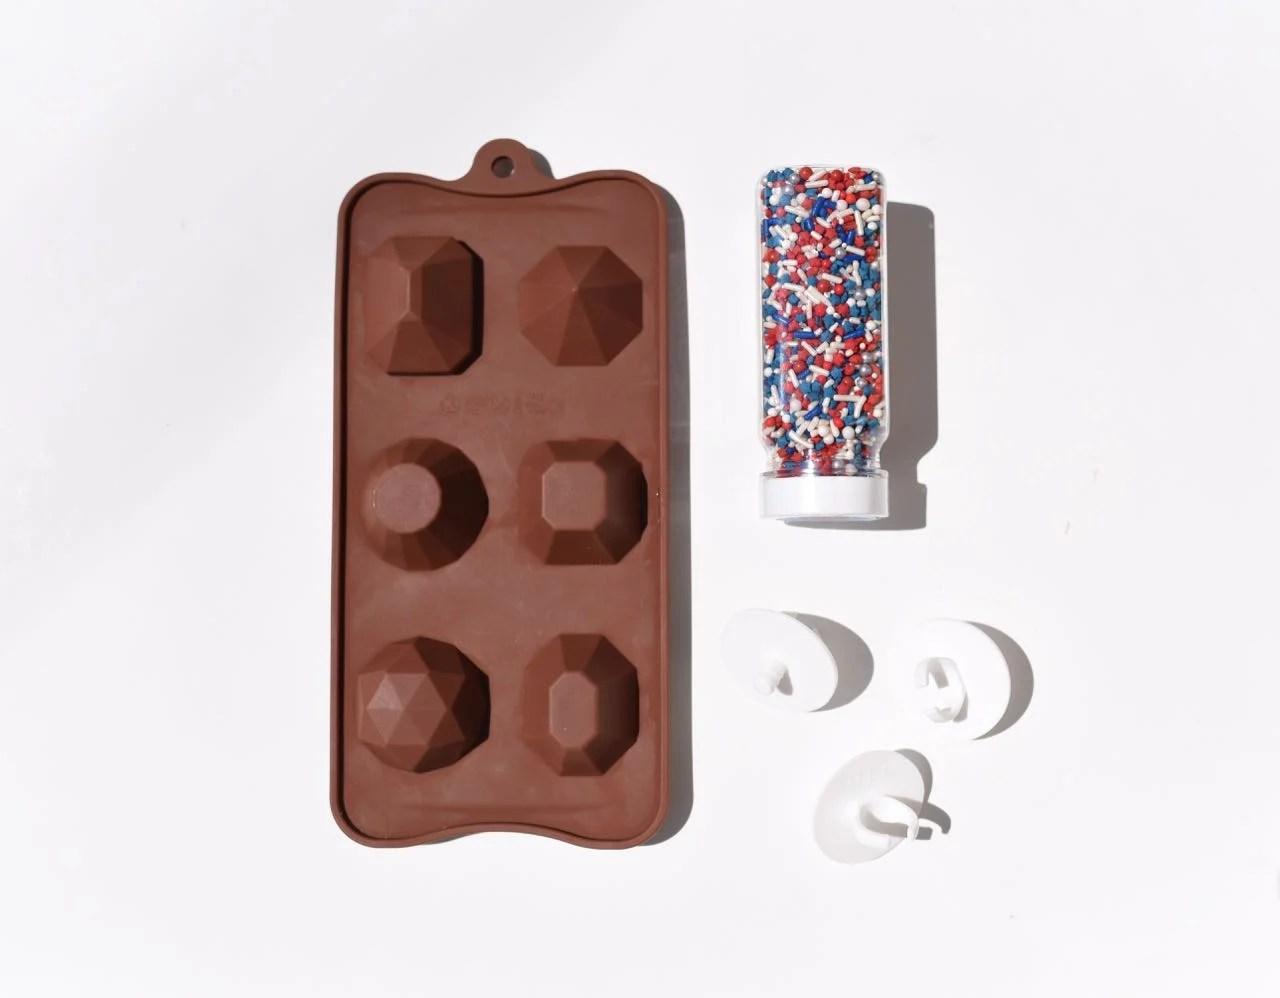 DIY Ring Pop Supplies